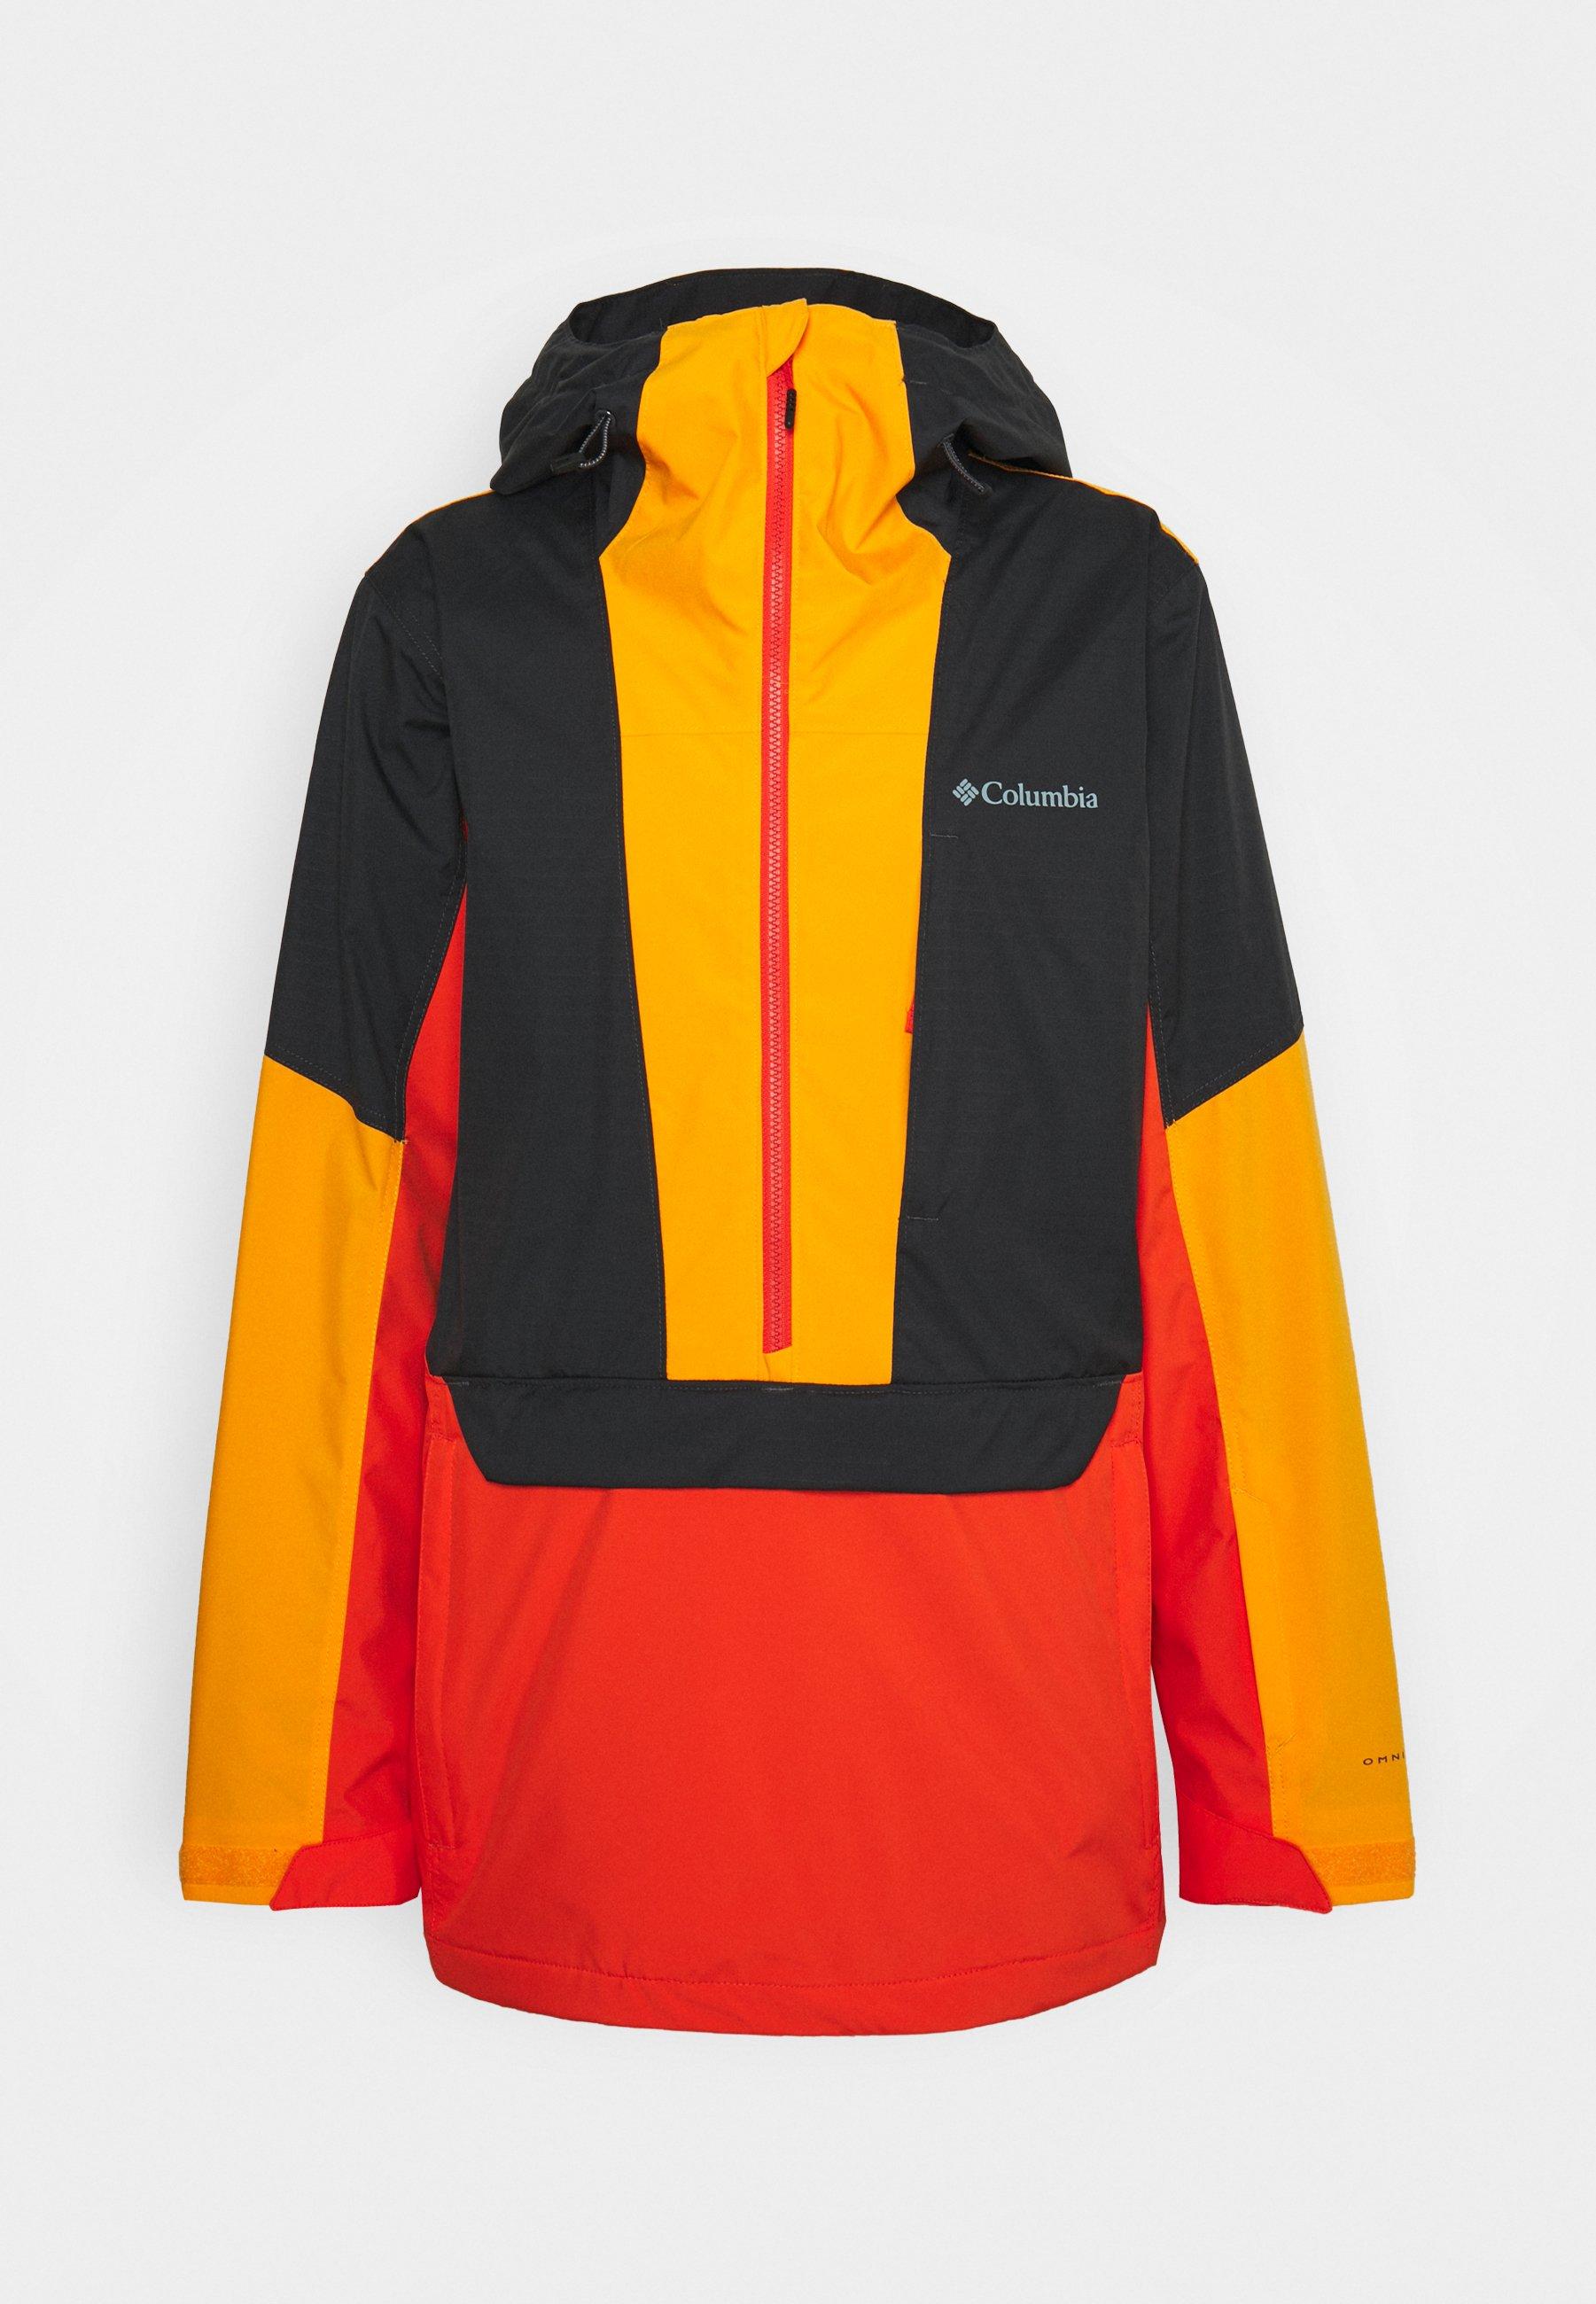 Homme AERIAL ASCENDER™ ANORAK - Veste de ski